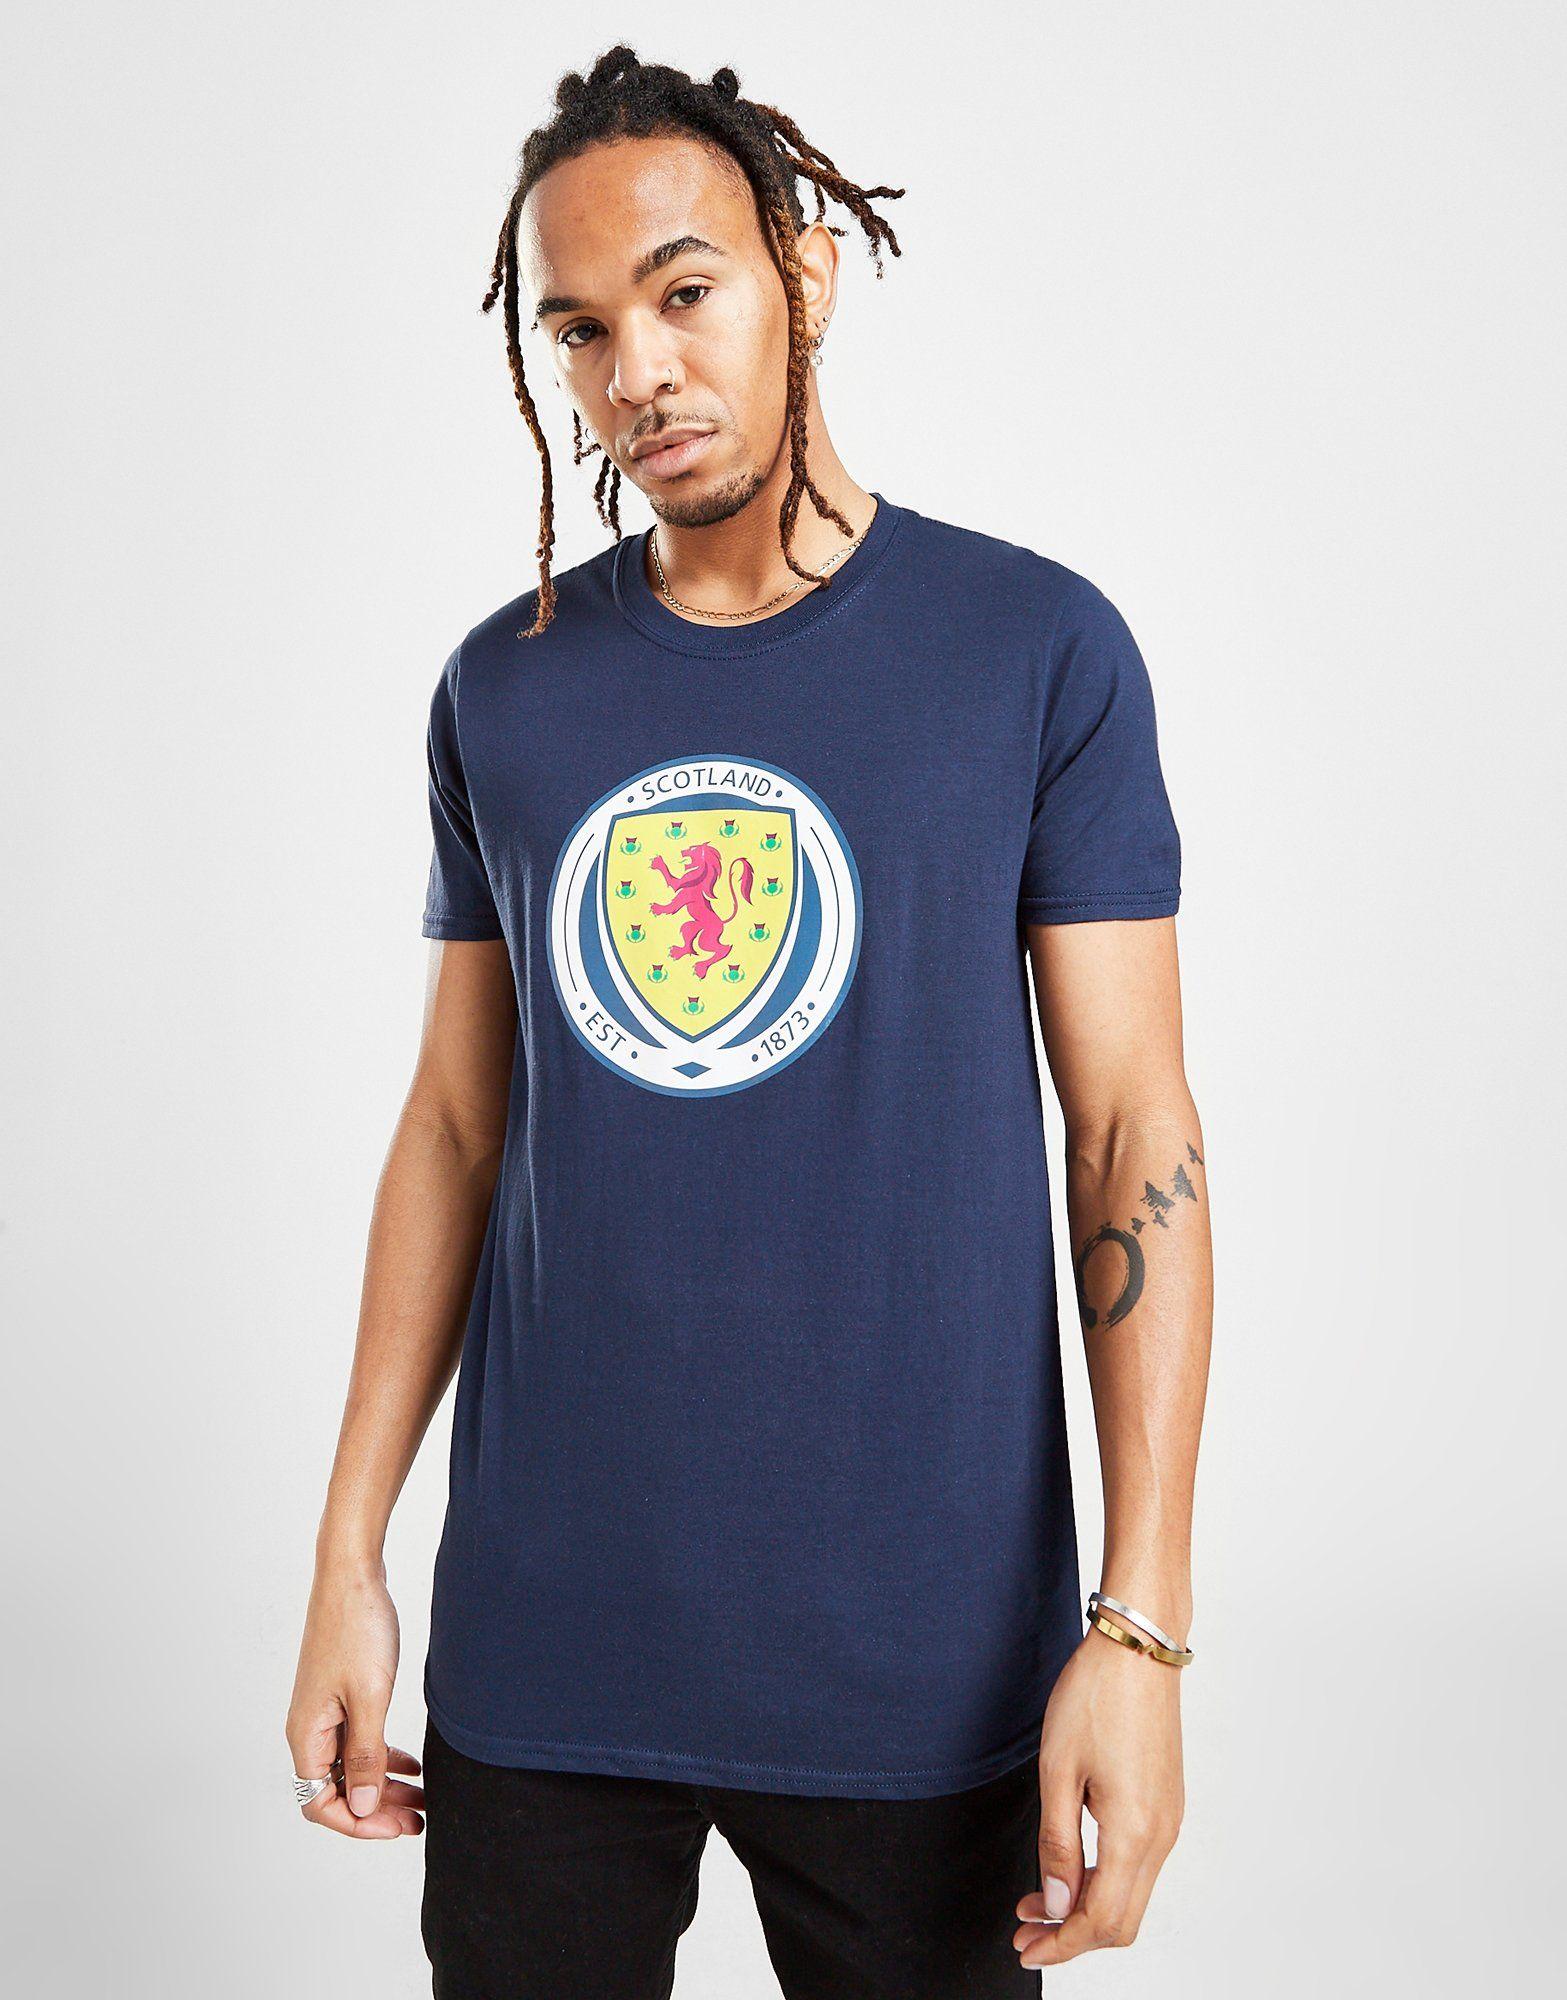 Official Team Scotland FA Crest T-Shirt